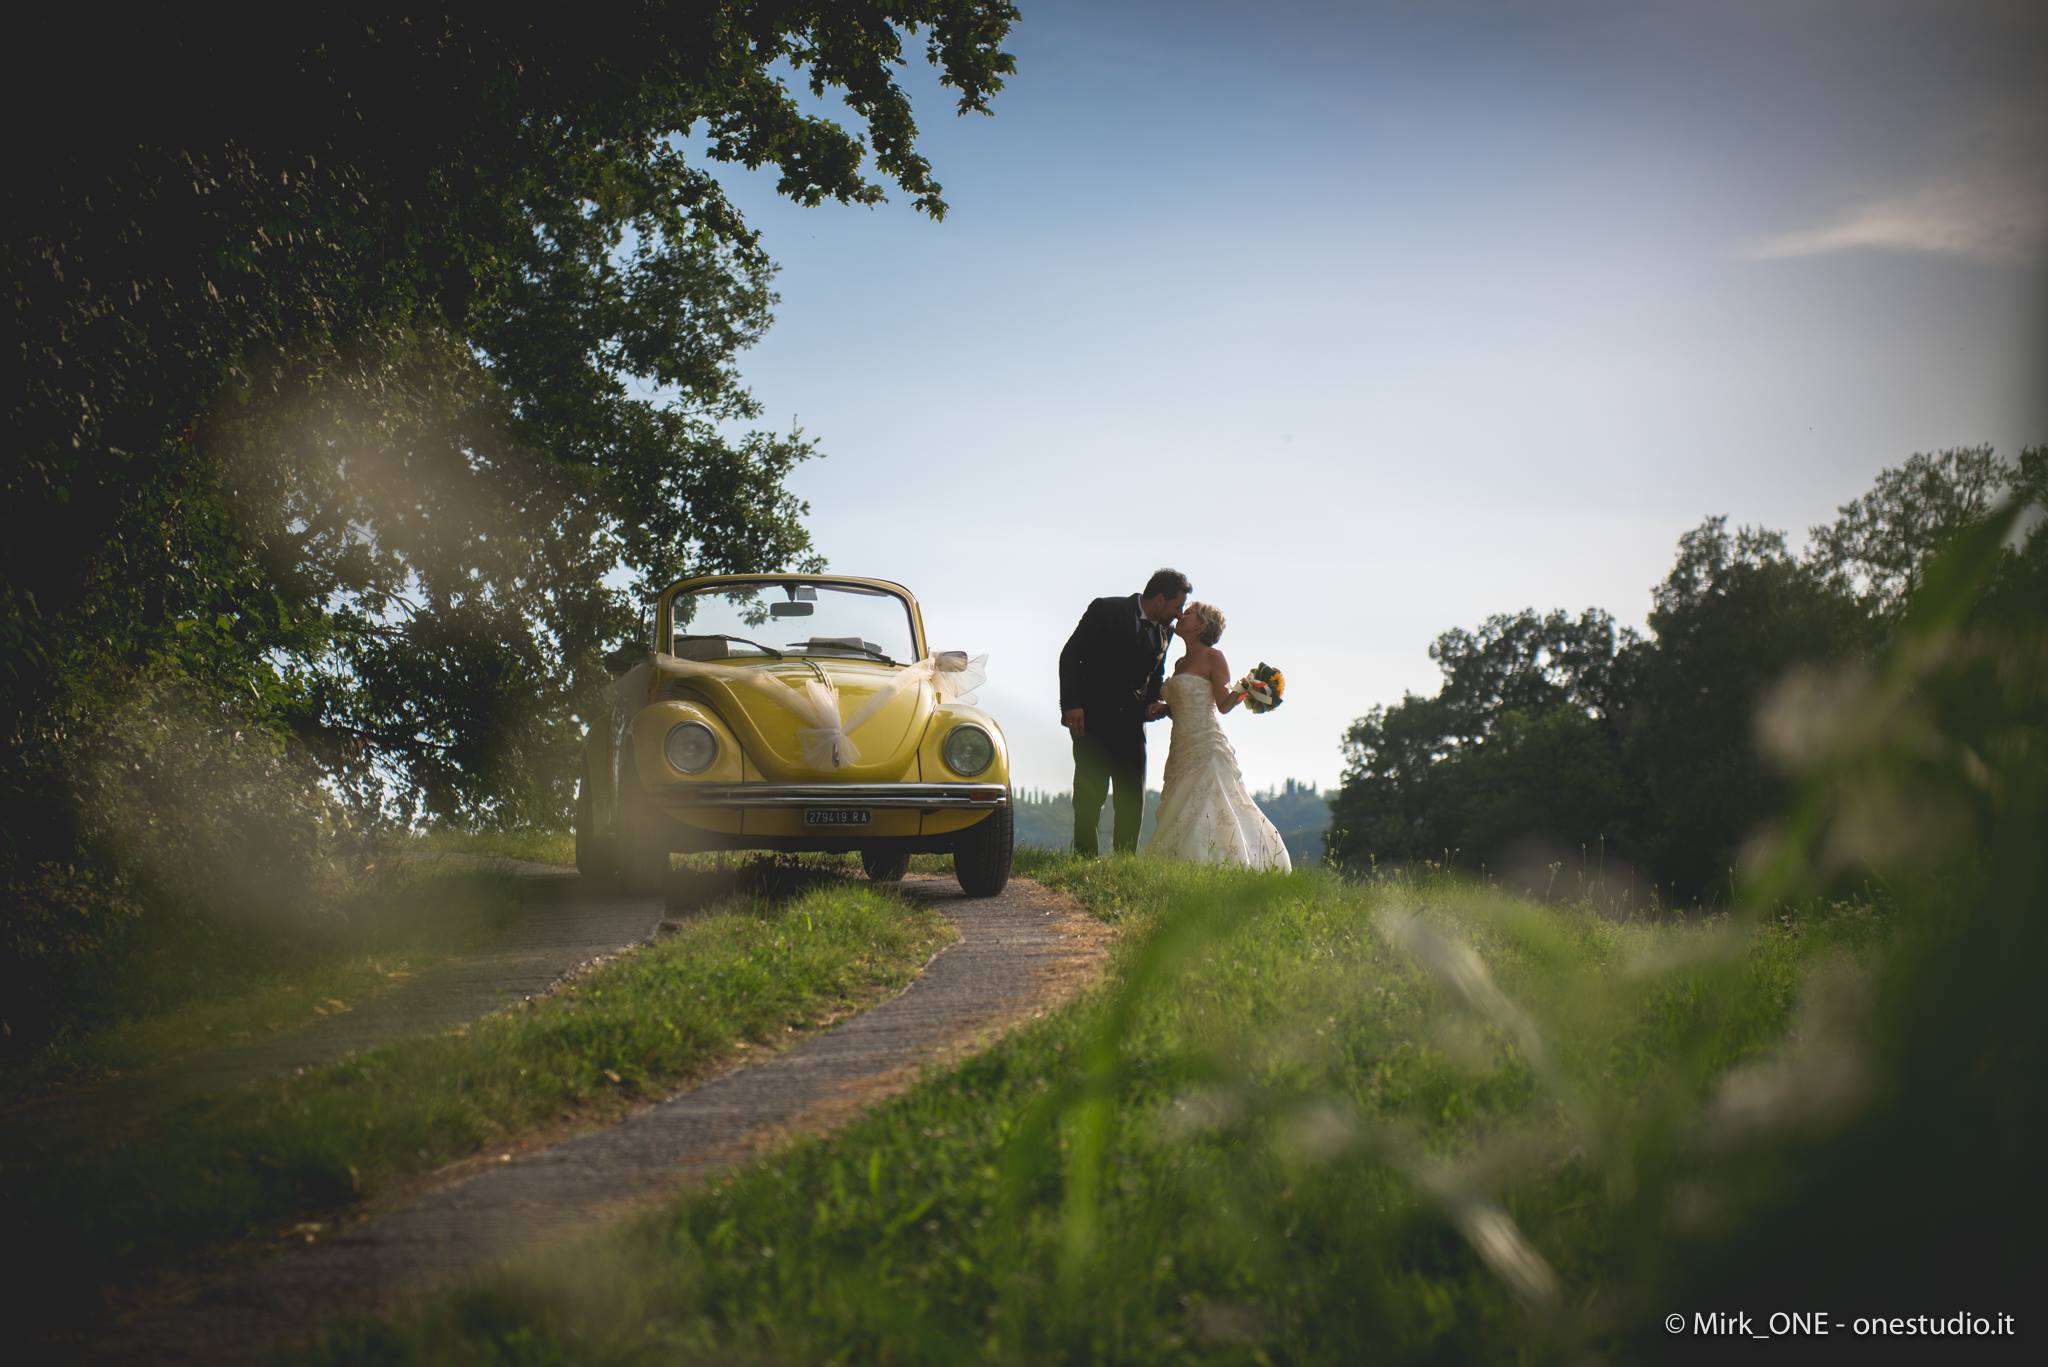 https://lnx.mirkone.it/wp-content/uploads/2015/07/mirk_ONE-fotografo-matrimonio-00808.jpg